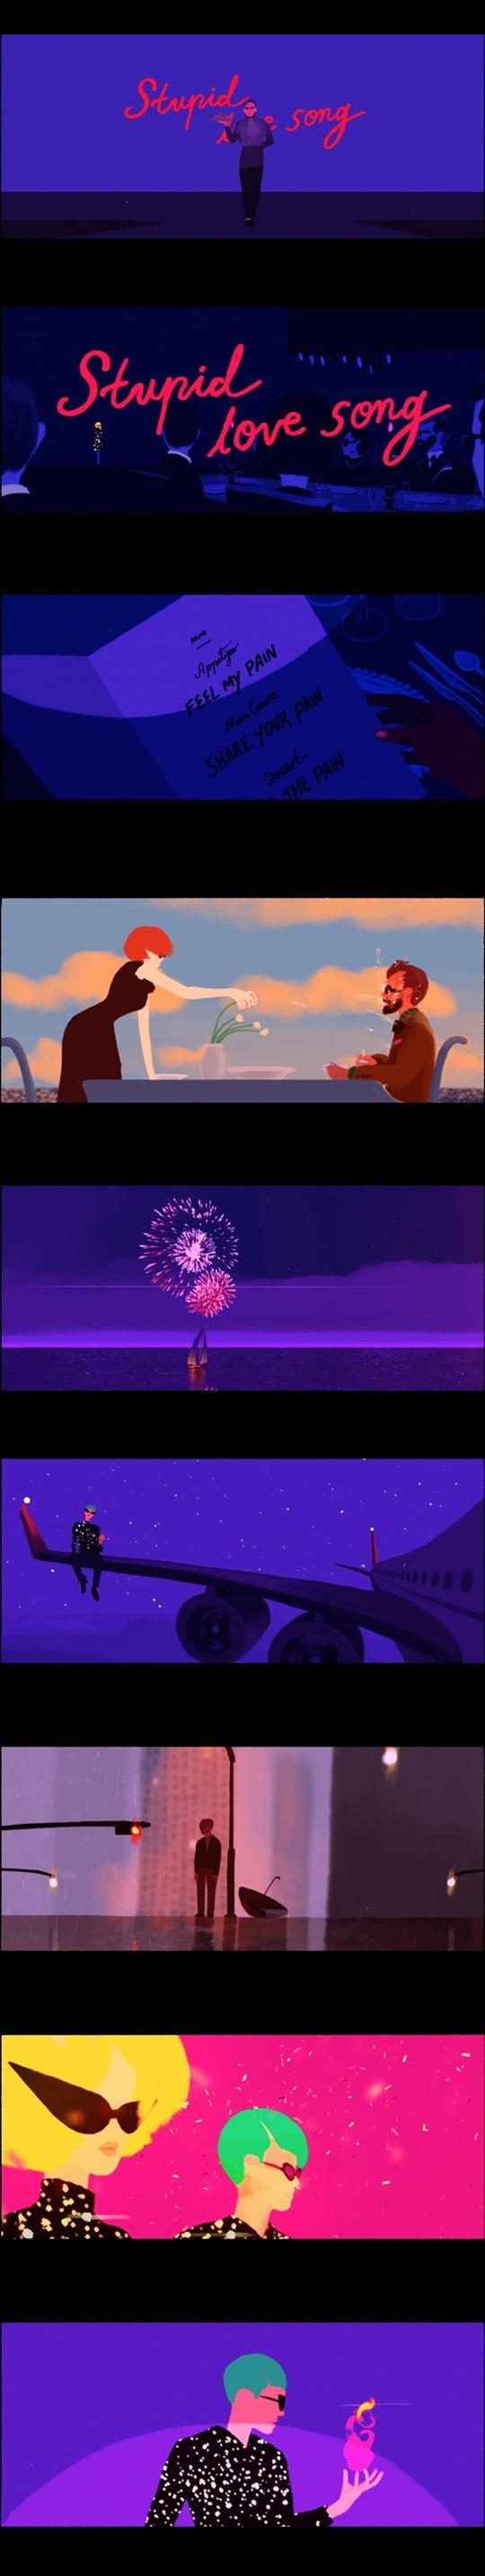 AKMU, 'Stupid love song' 오피셜 비디오 공개…아련한 감성 자극